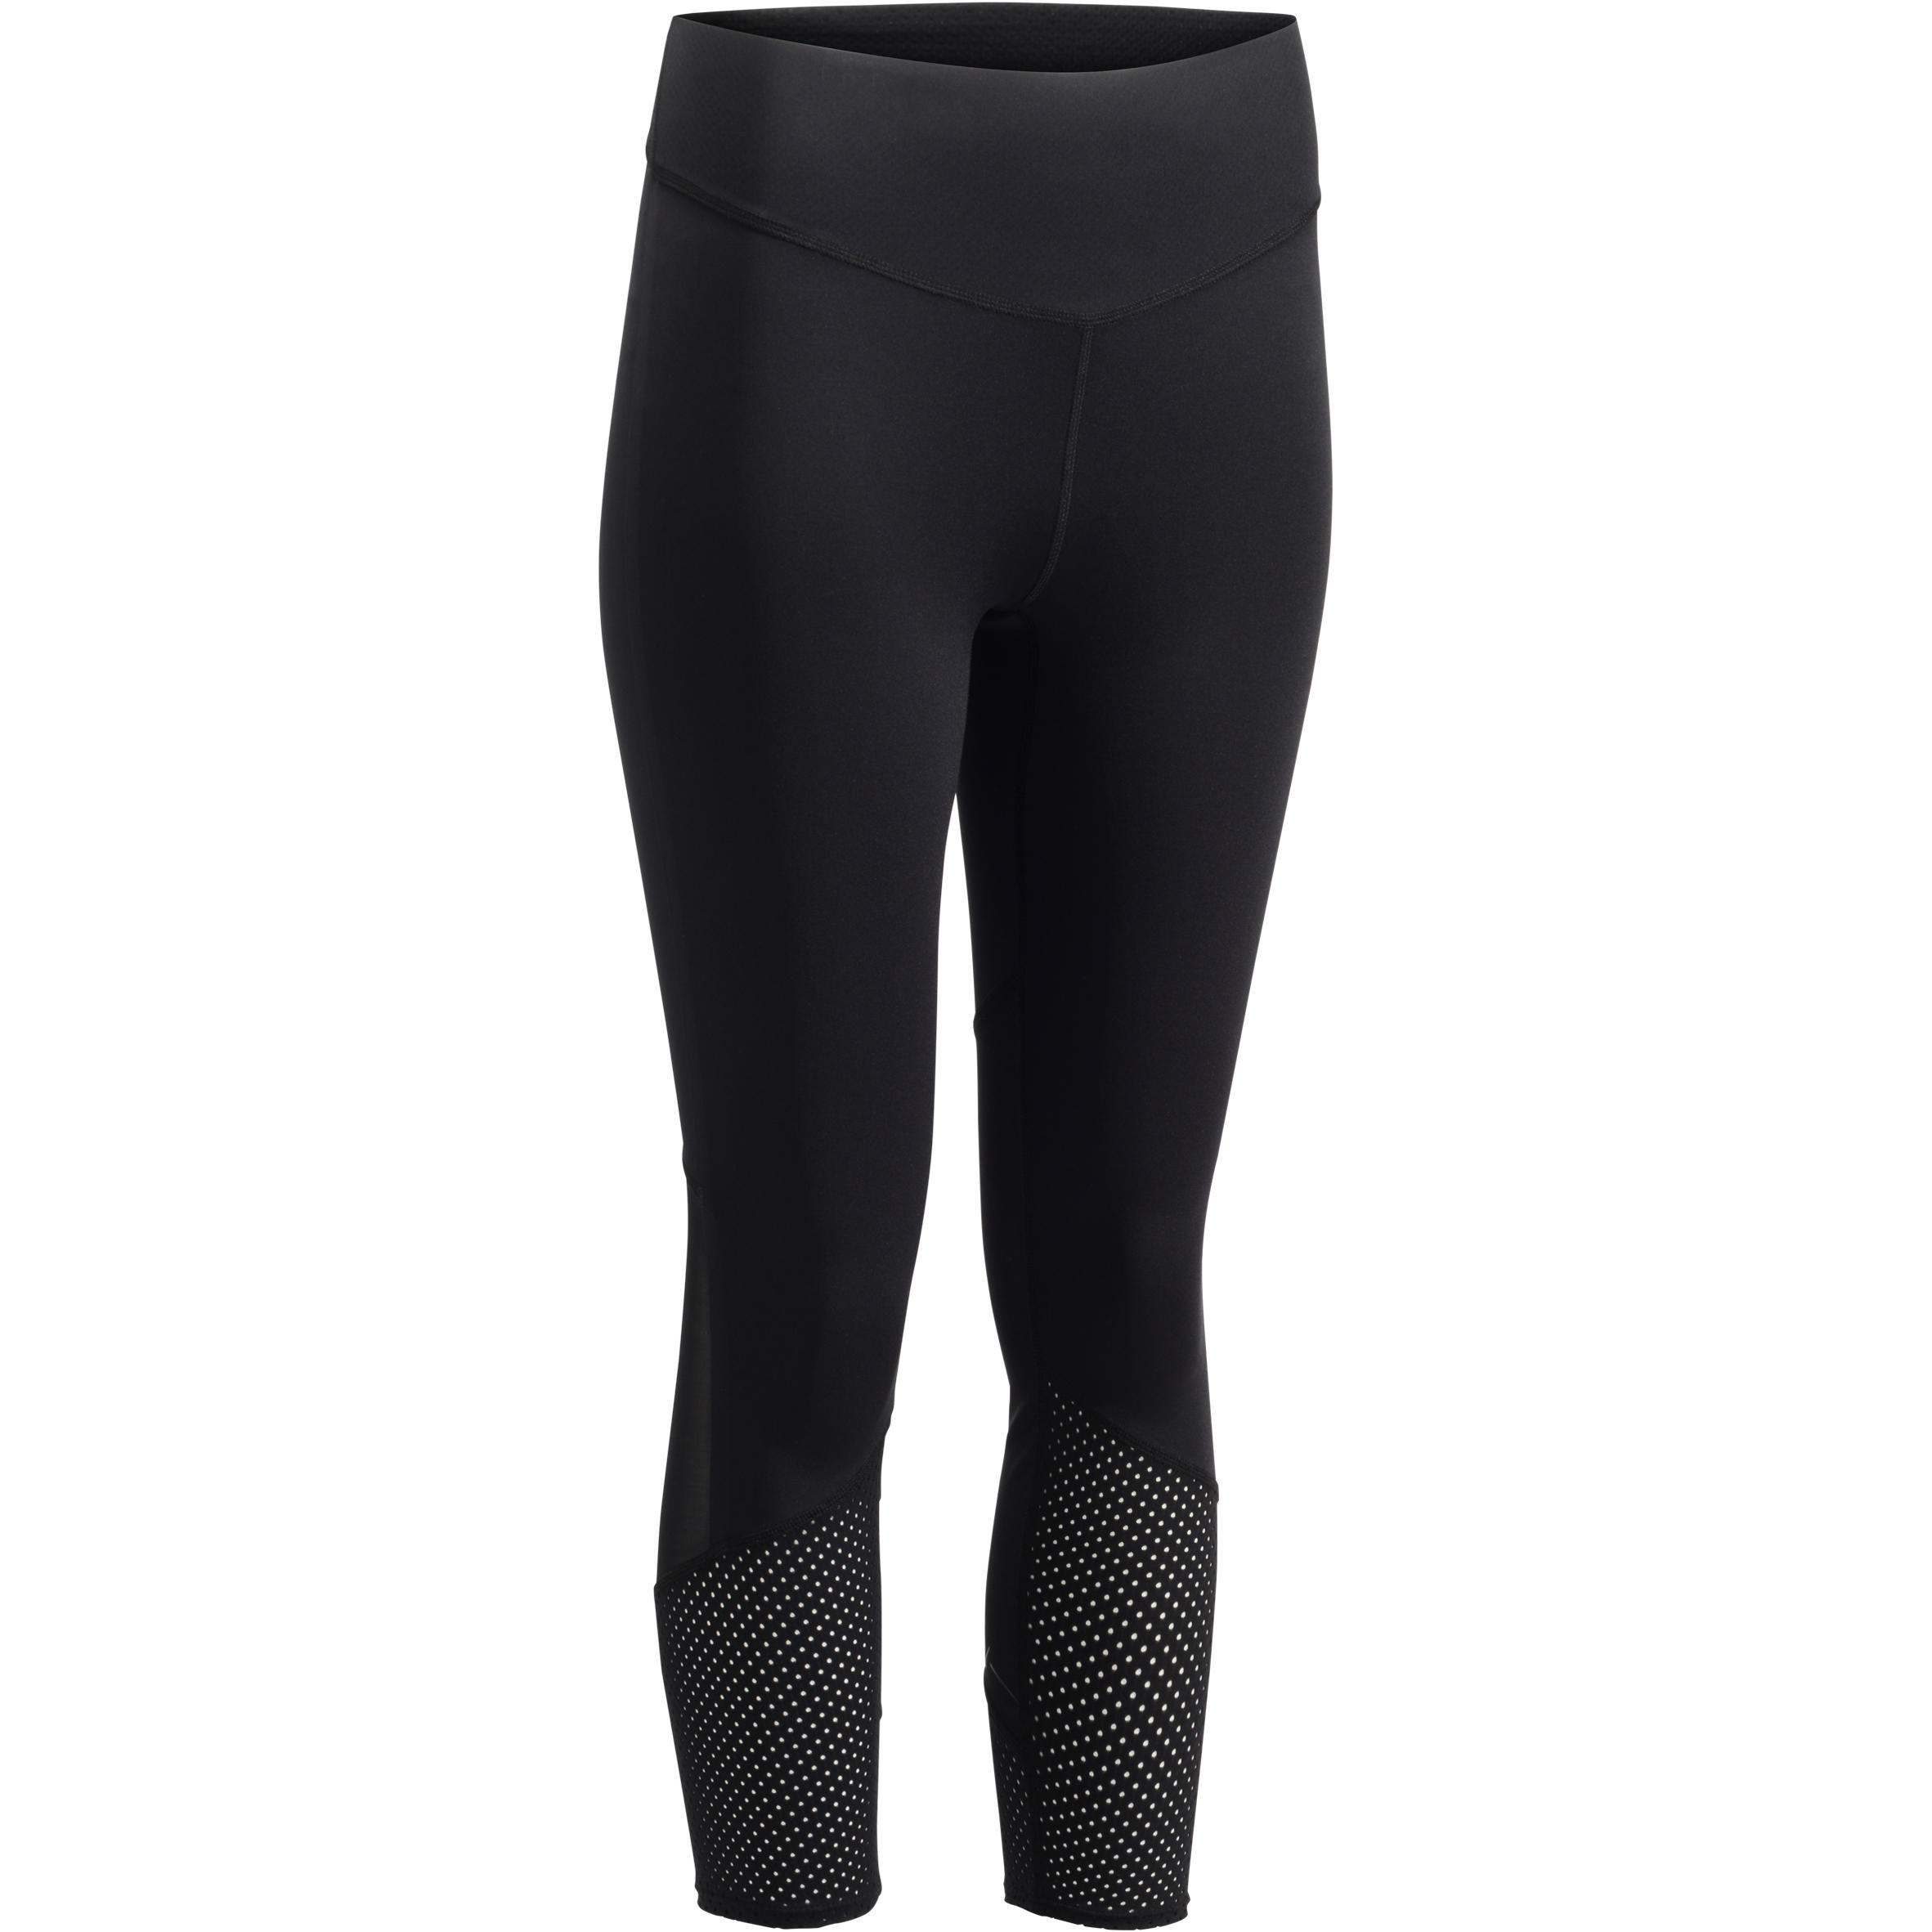 900 Women's 7/8 Cardio Fitness Leggings - Black